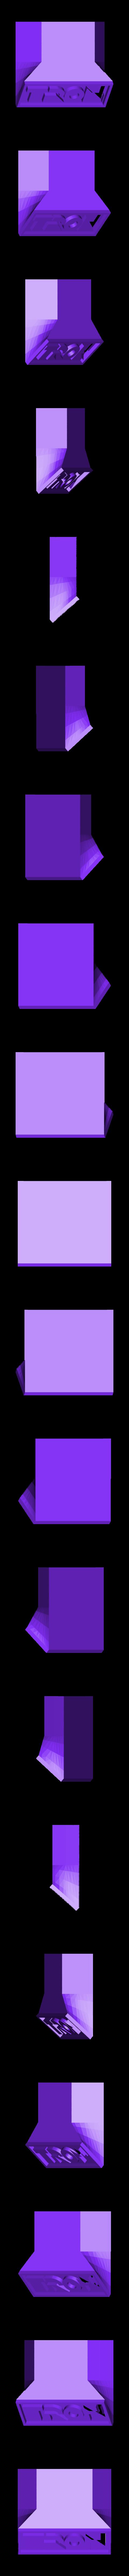 Lightcycle_Display_Stand.STL Télécharger fichier STL gratuit Kit modèle Lightcycle • Objet pour impression 3D, billythemighty3Dprinter